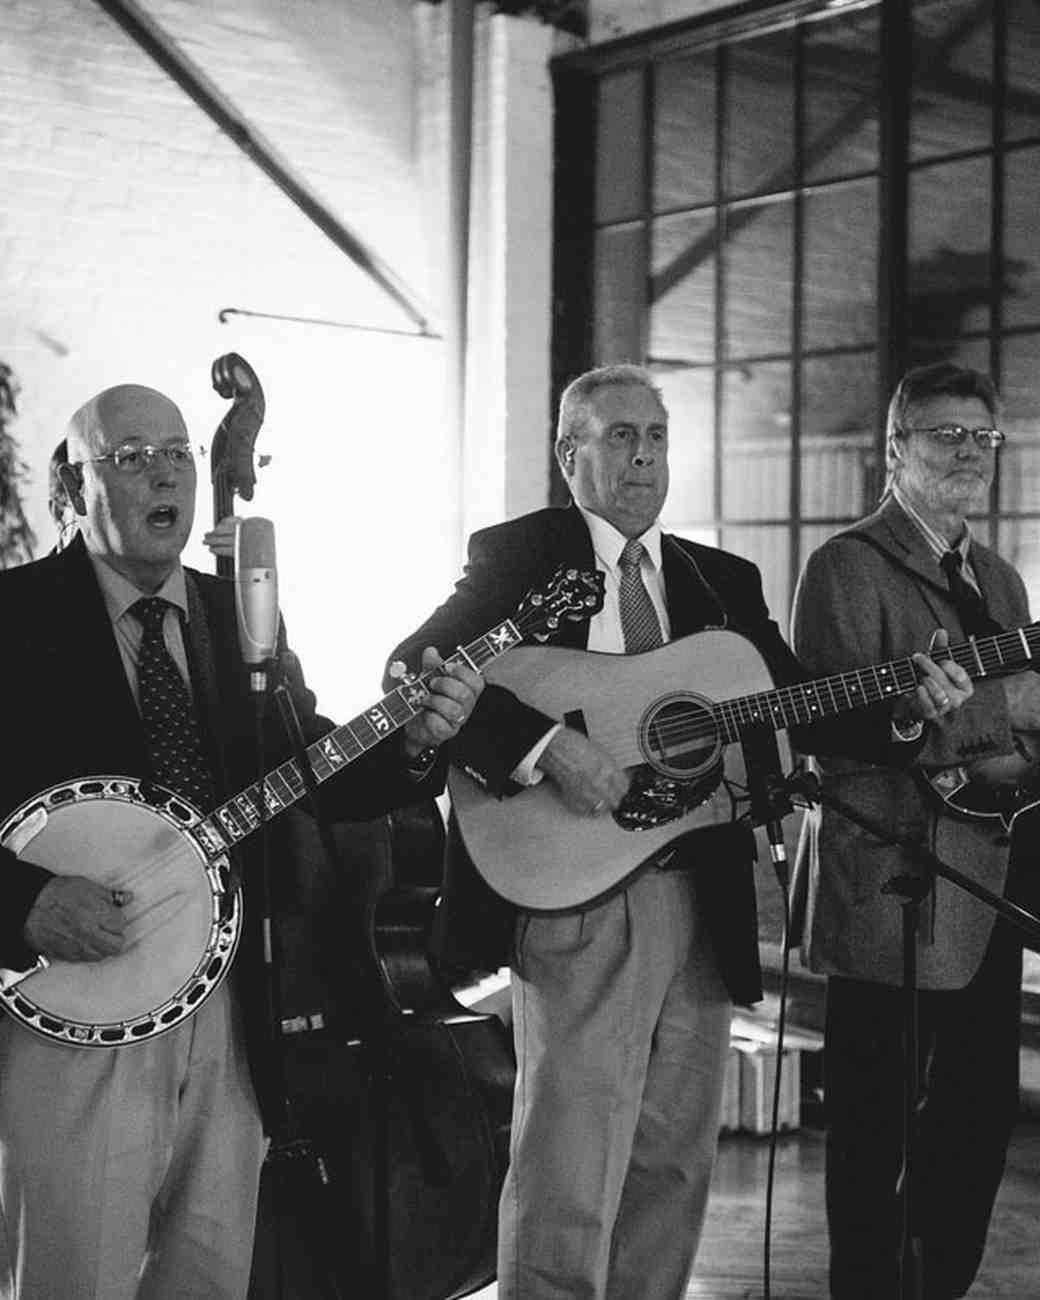 wedding-band-musicians-4-0516.jpg